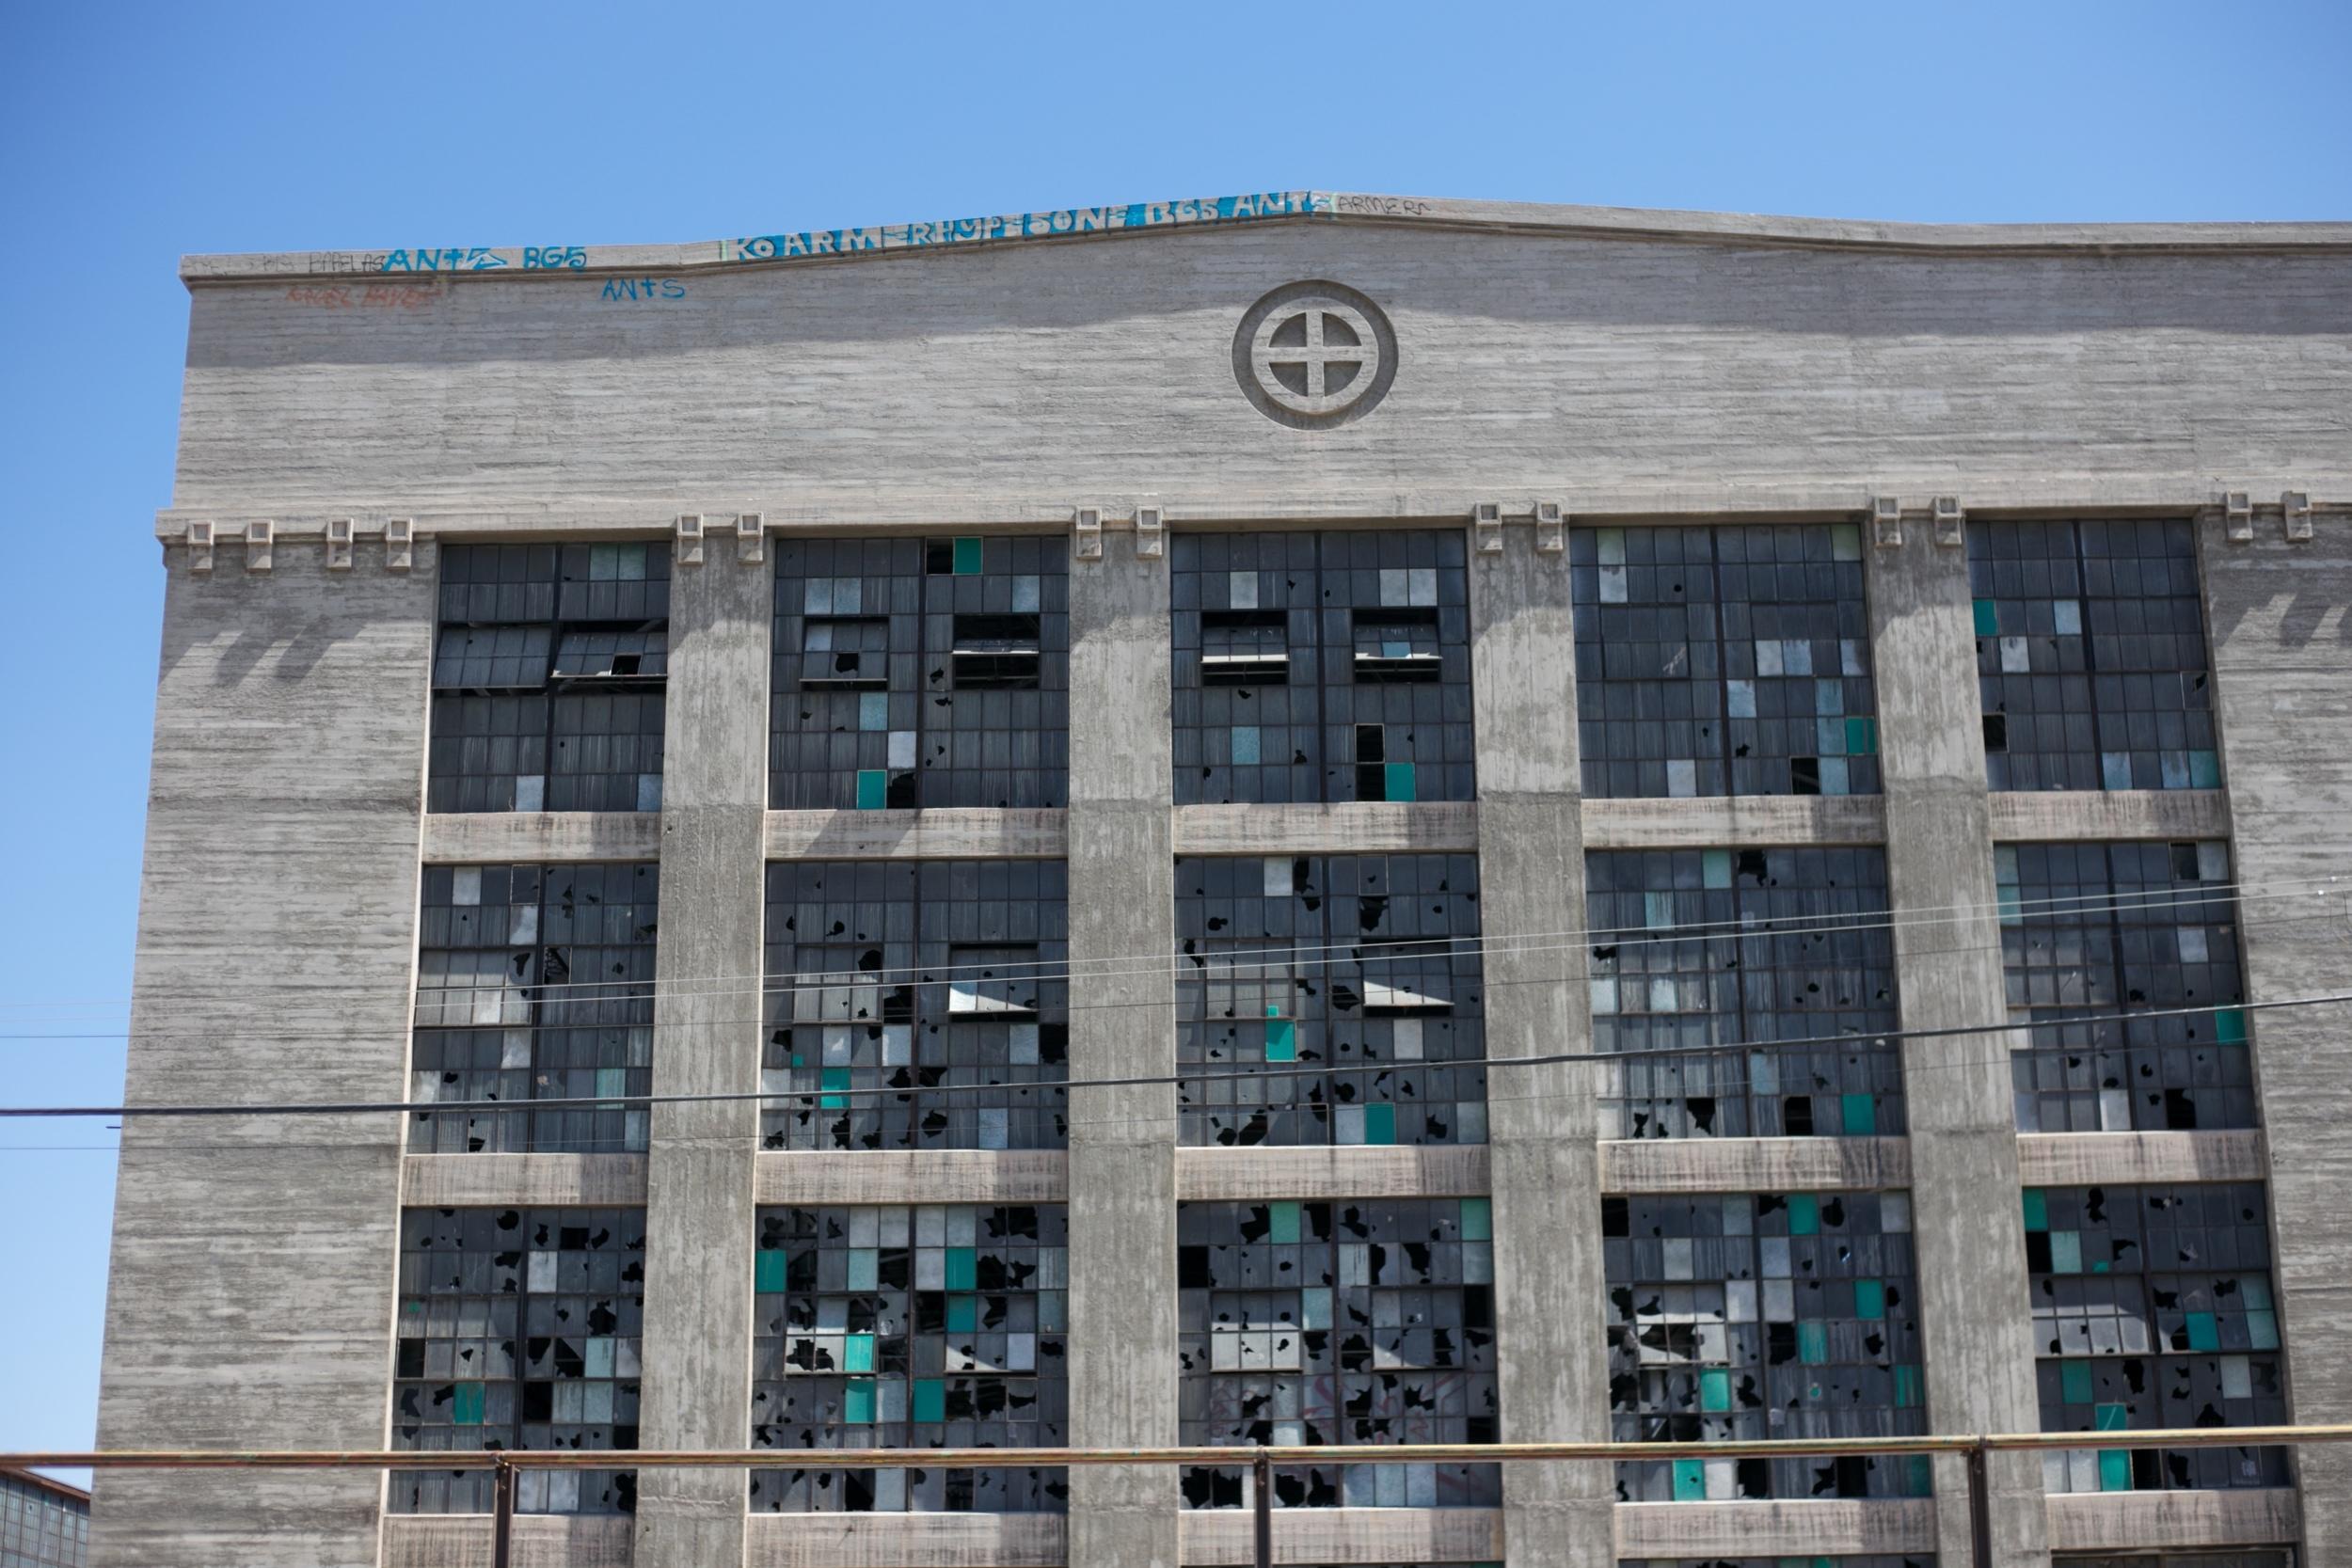 Glass windows at the Rail Yards.